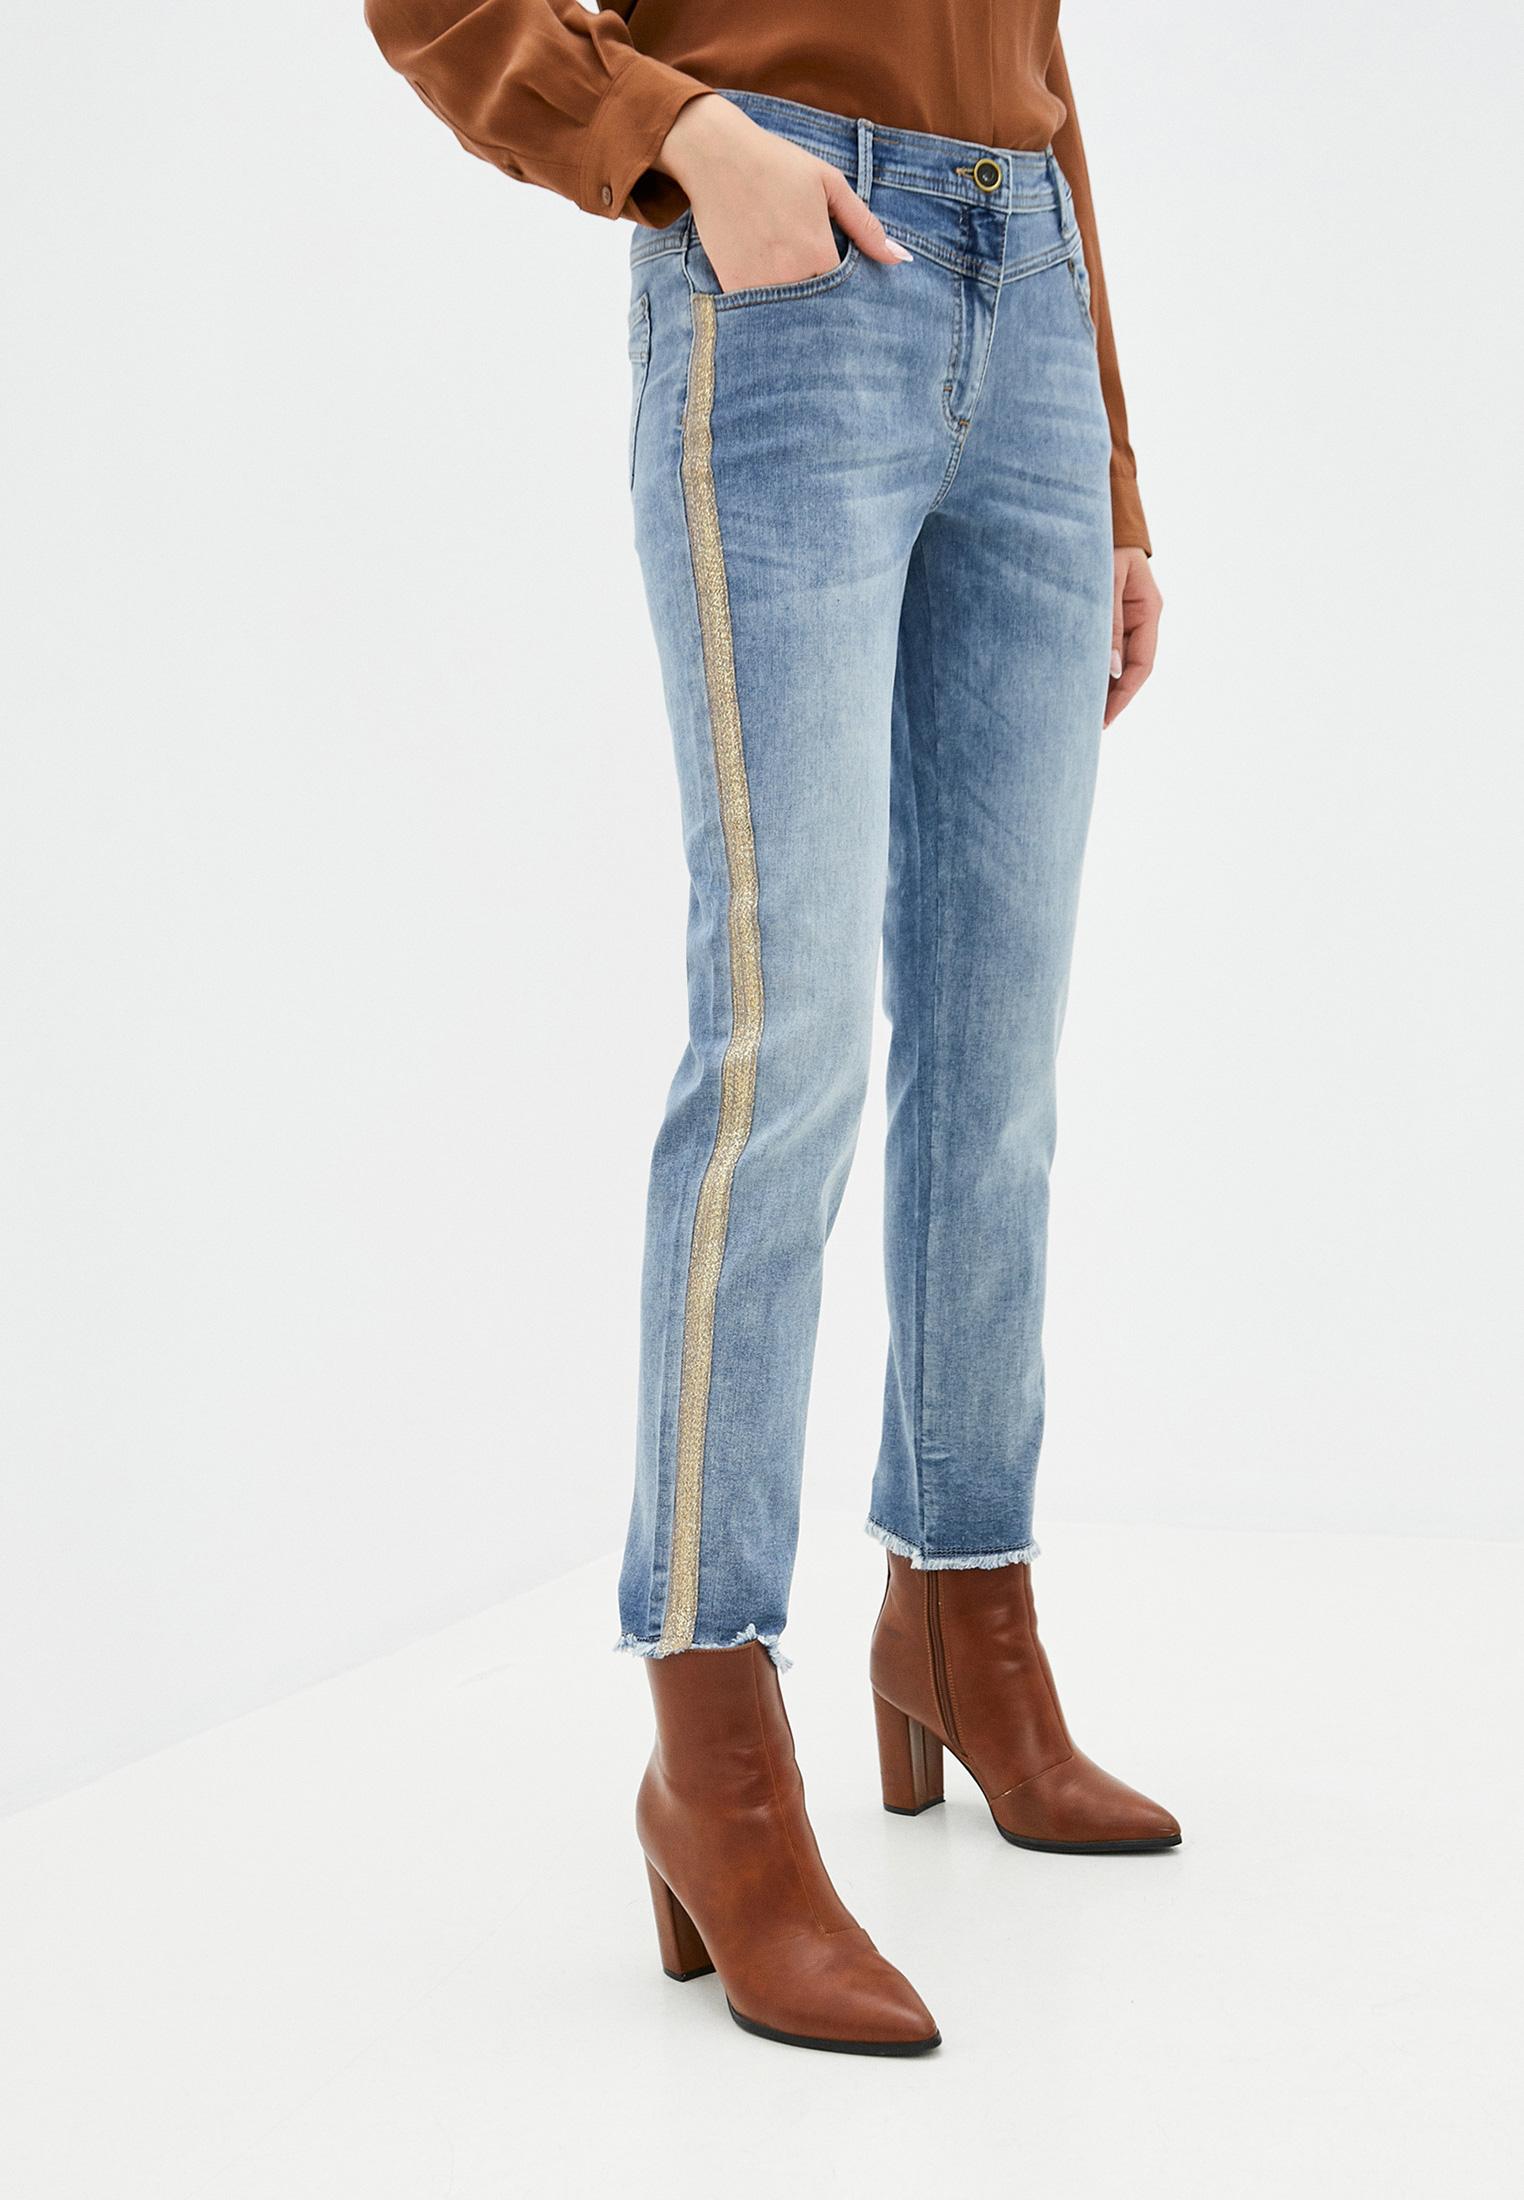 Женские джинсы Betty Barclay 6174/1939